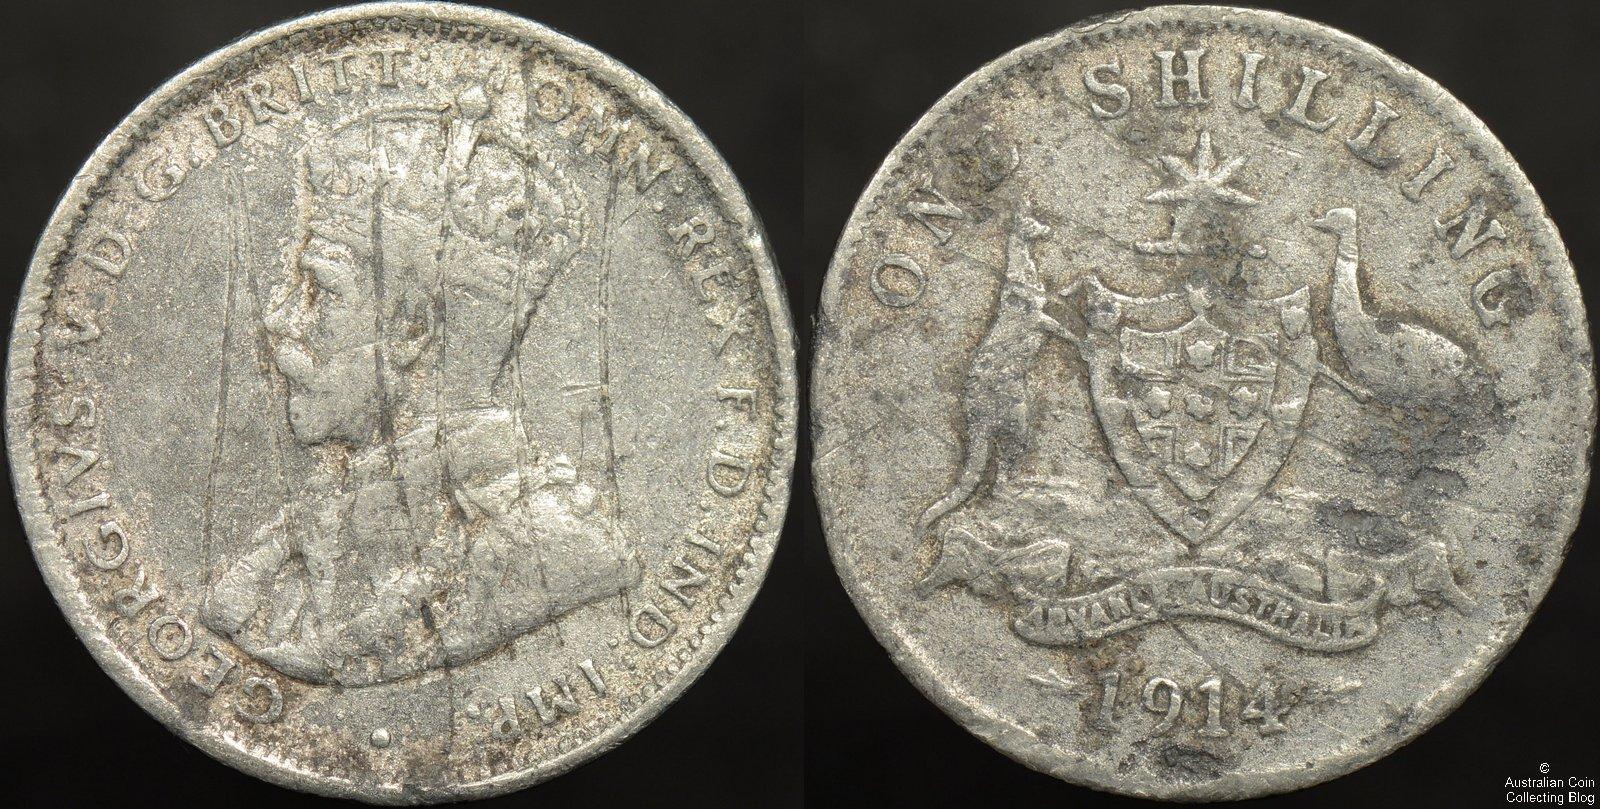 Australia 1914 Counterfeit Shilling